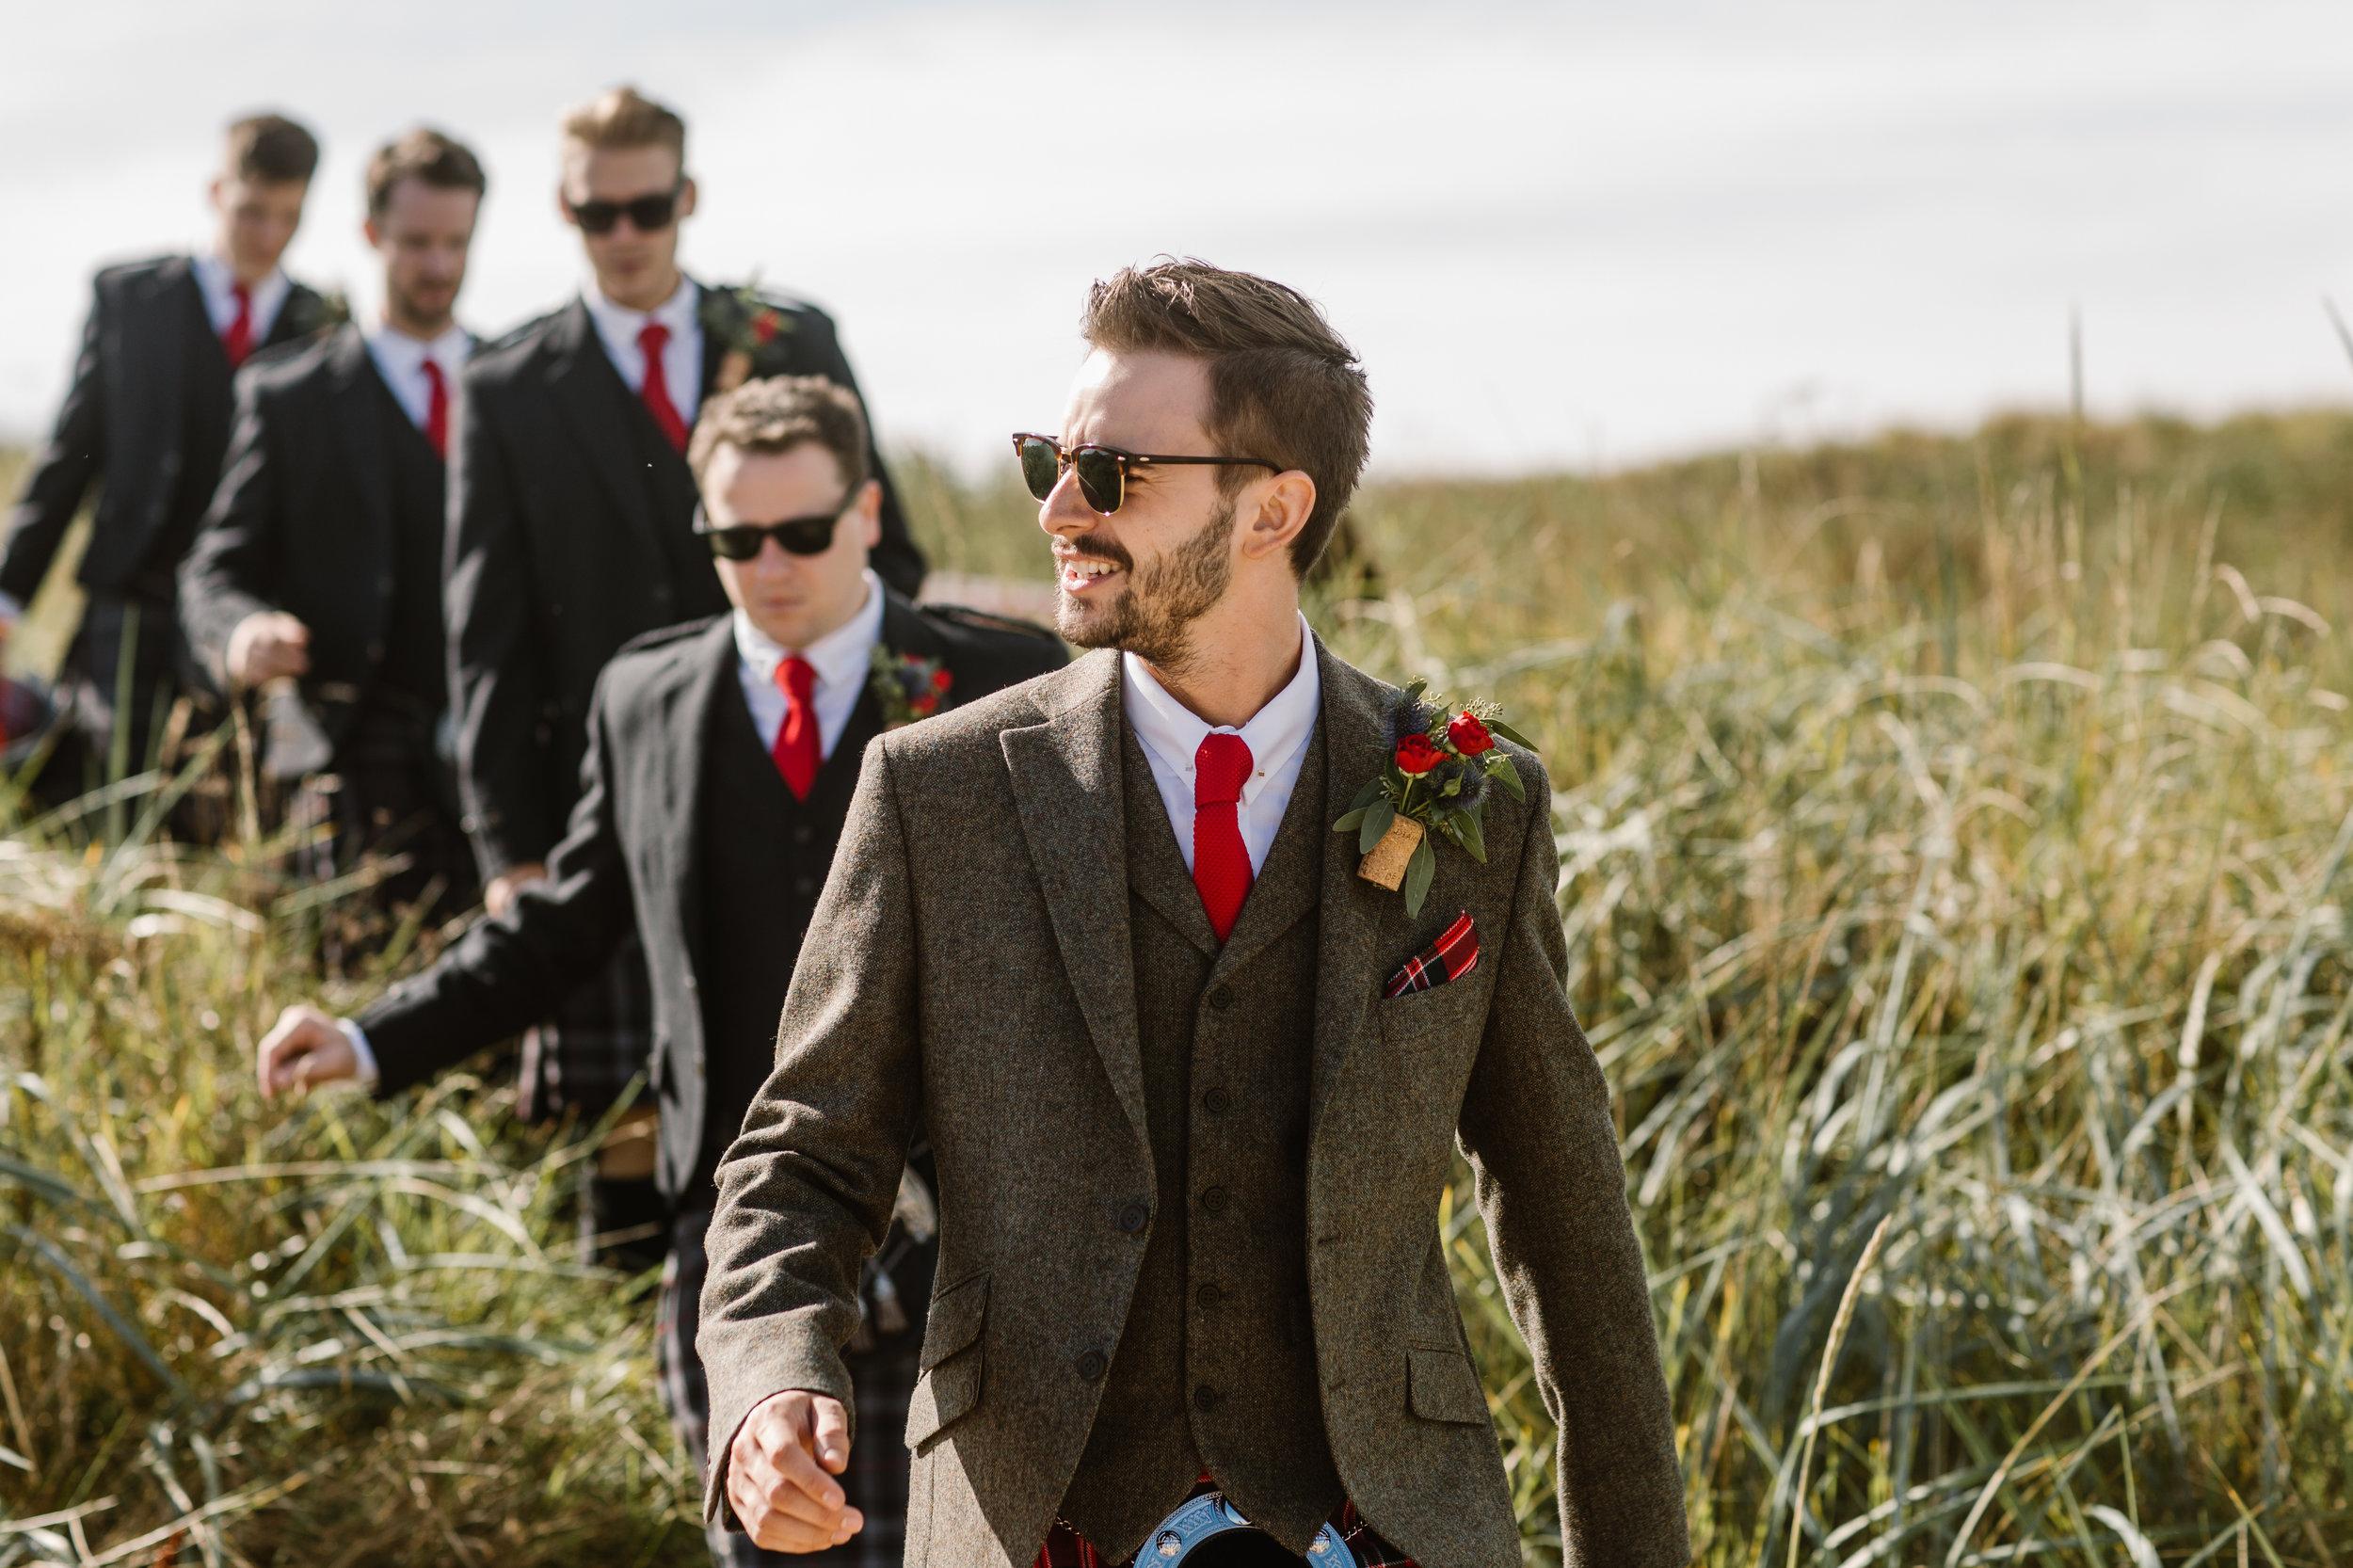 KInkell Byre Wedding0114 2.jpg